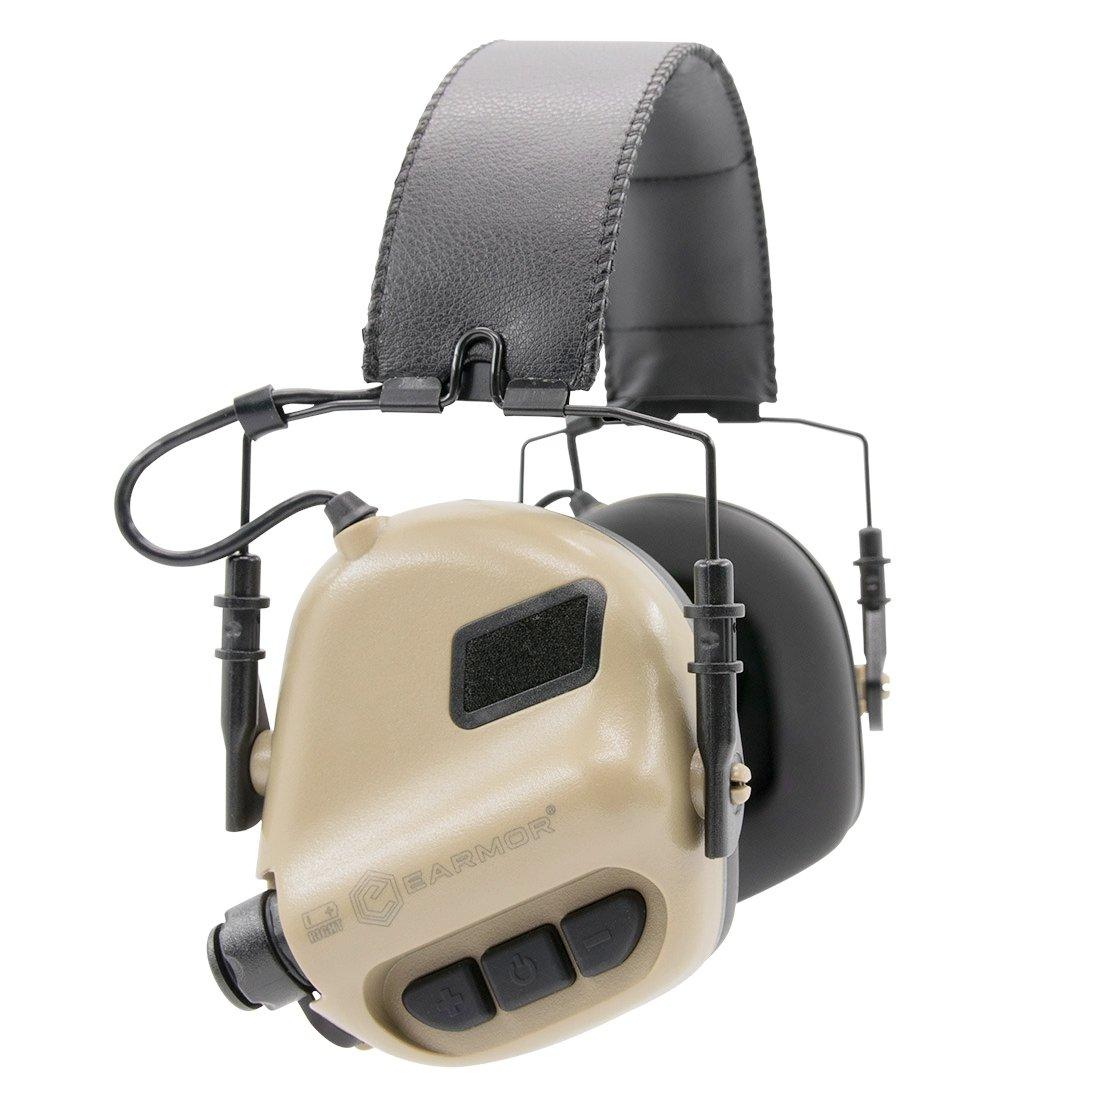 OPSMEN M31-MOD1 Sound Amplification Gun Shooting Noise Canceling Hearing Sport Protection Electronic Earmuff Classic Tan Desert